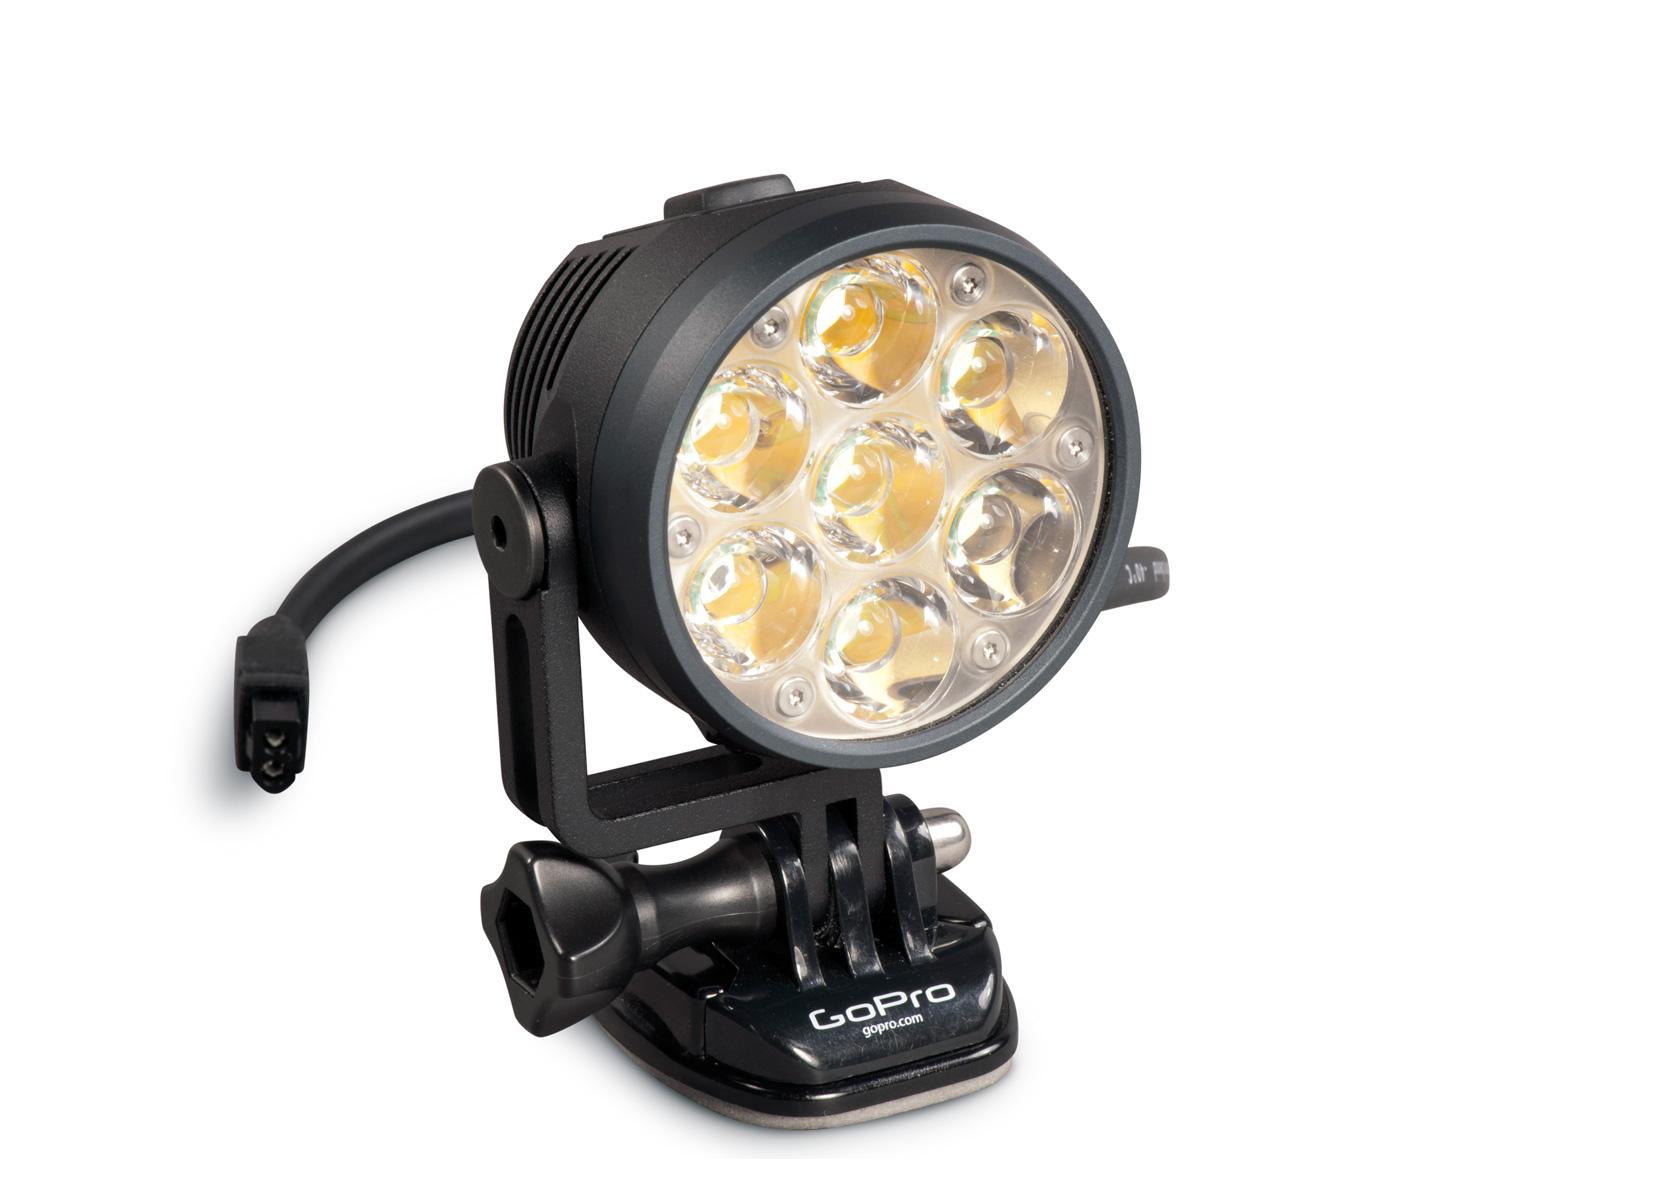 Betty R GoPro Adapter